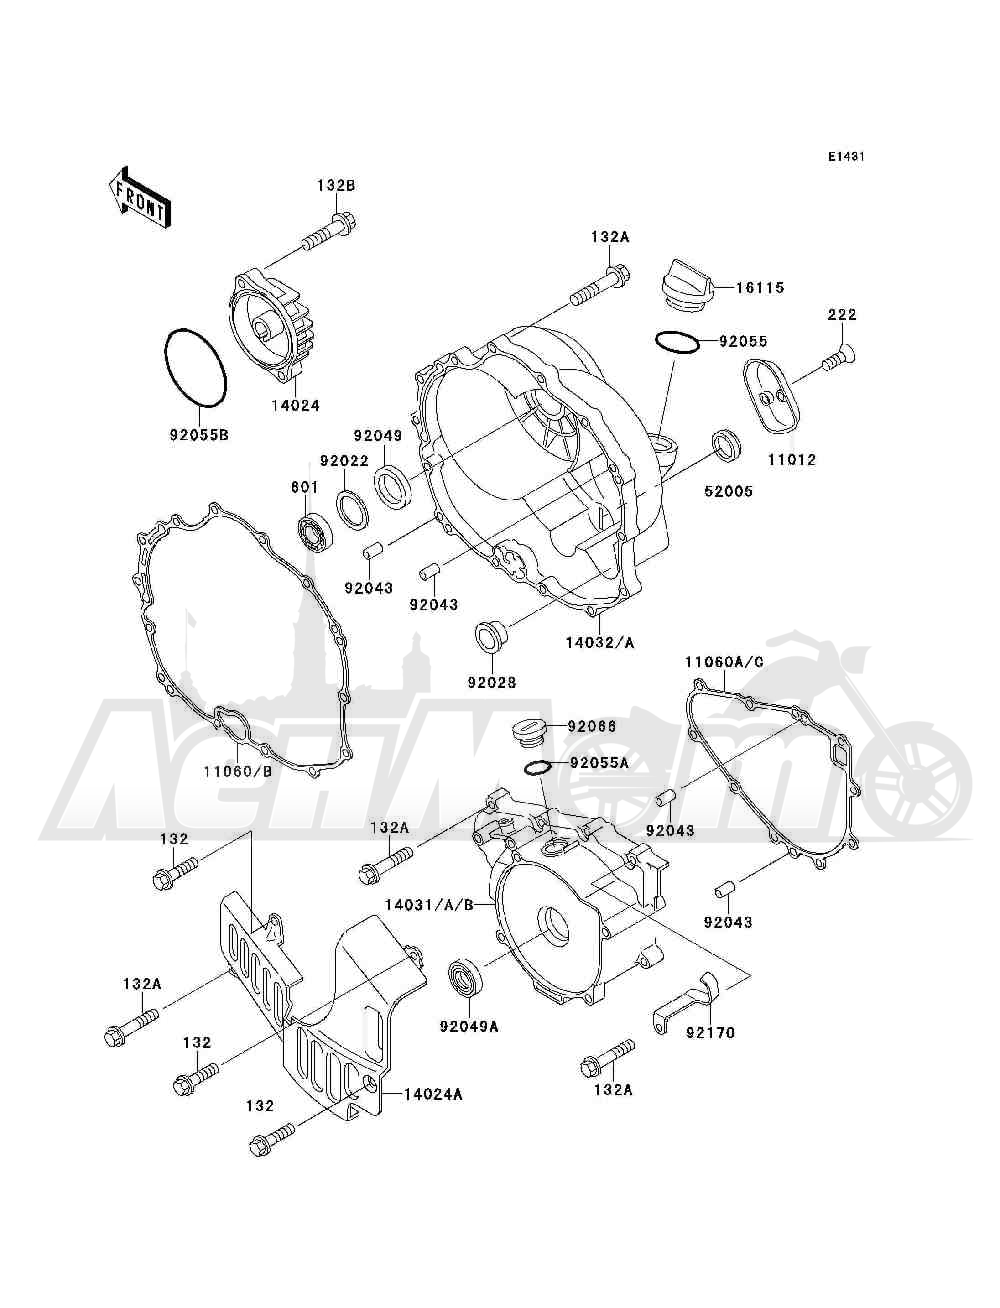 Запчасти для Квадроцикла Kawasaki 1993 BAYOU 300 4X4 (KLF300-C5) Раздел: ENGINE COVER(S) | крышка двигателя (S)